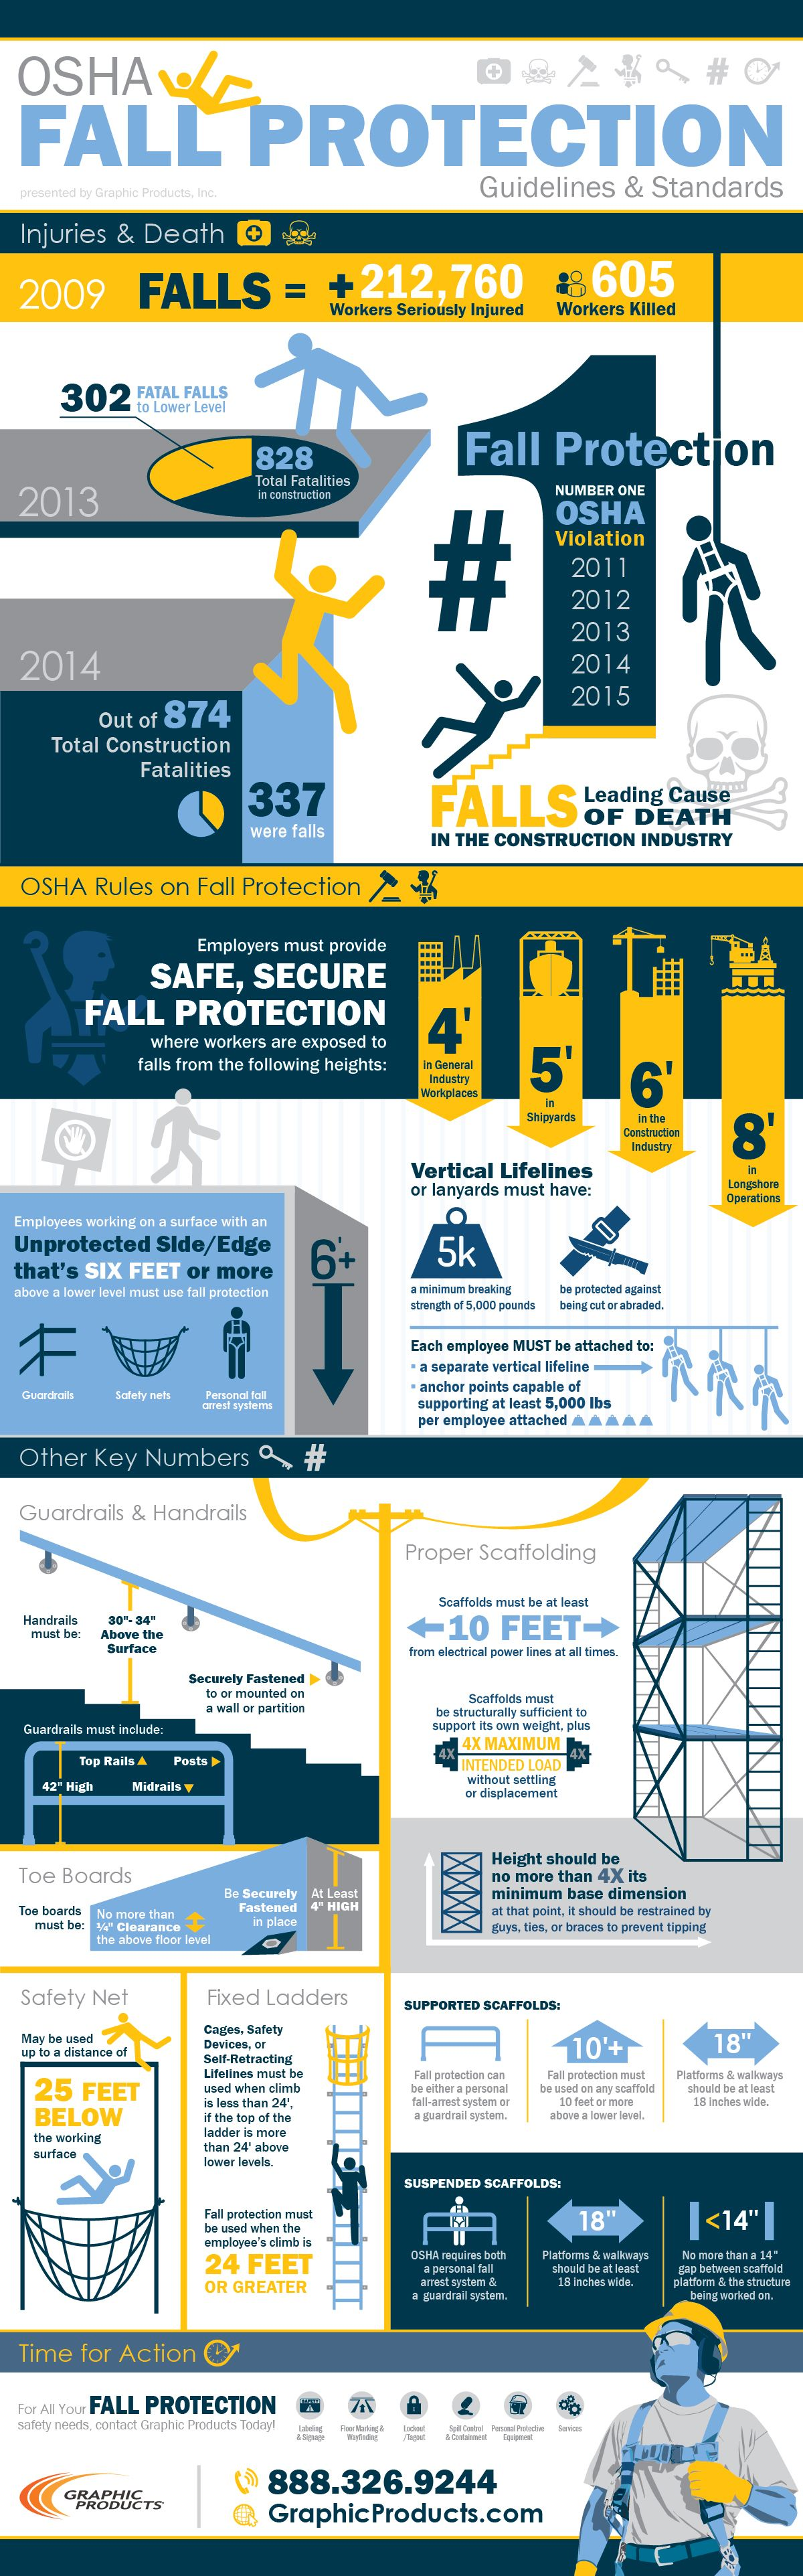 The informative visual encapsulates OSHA's standards and